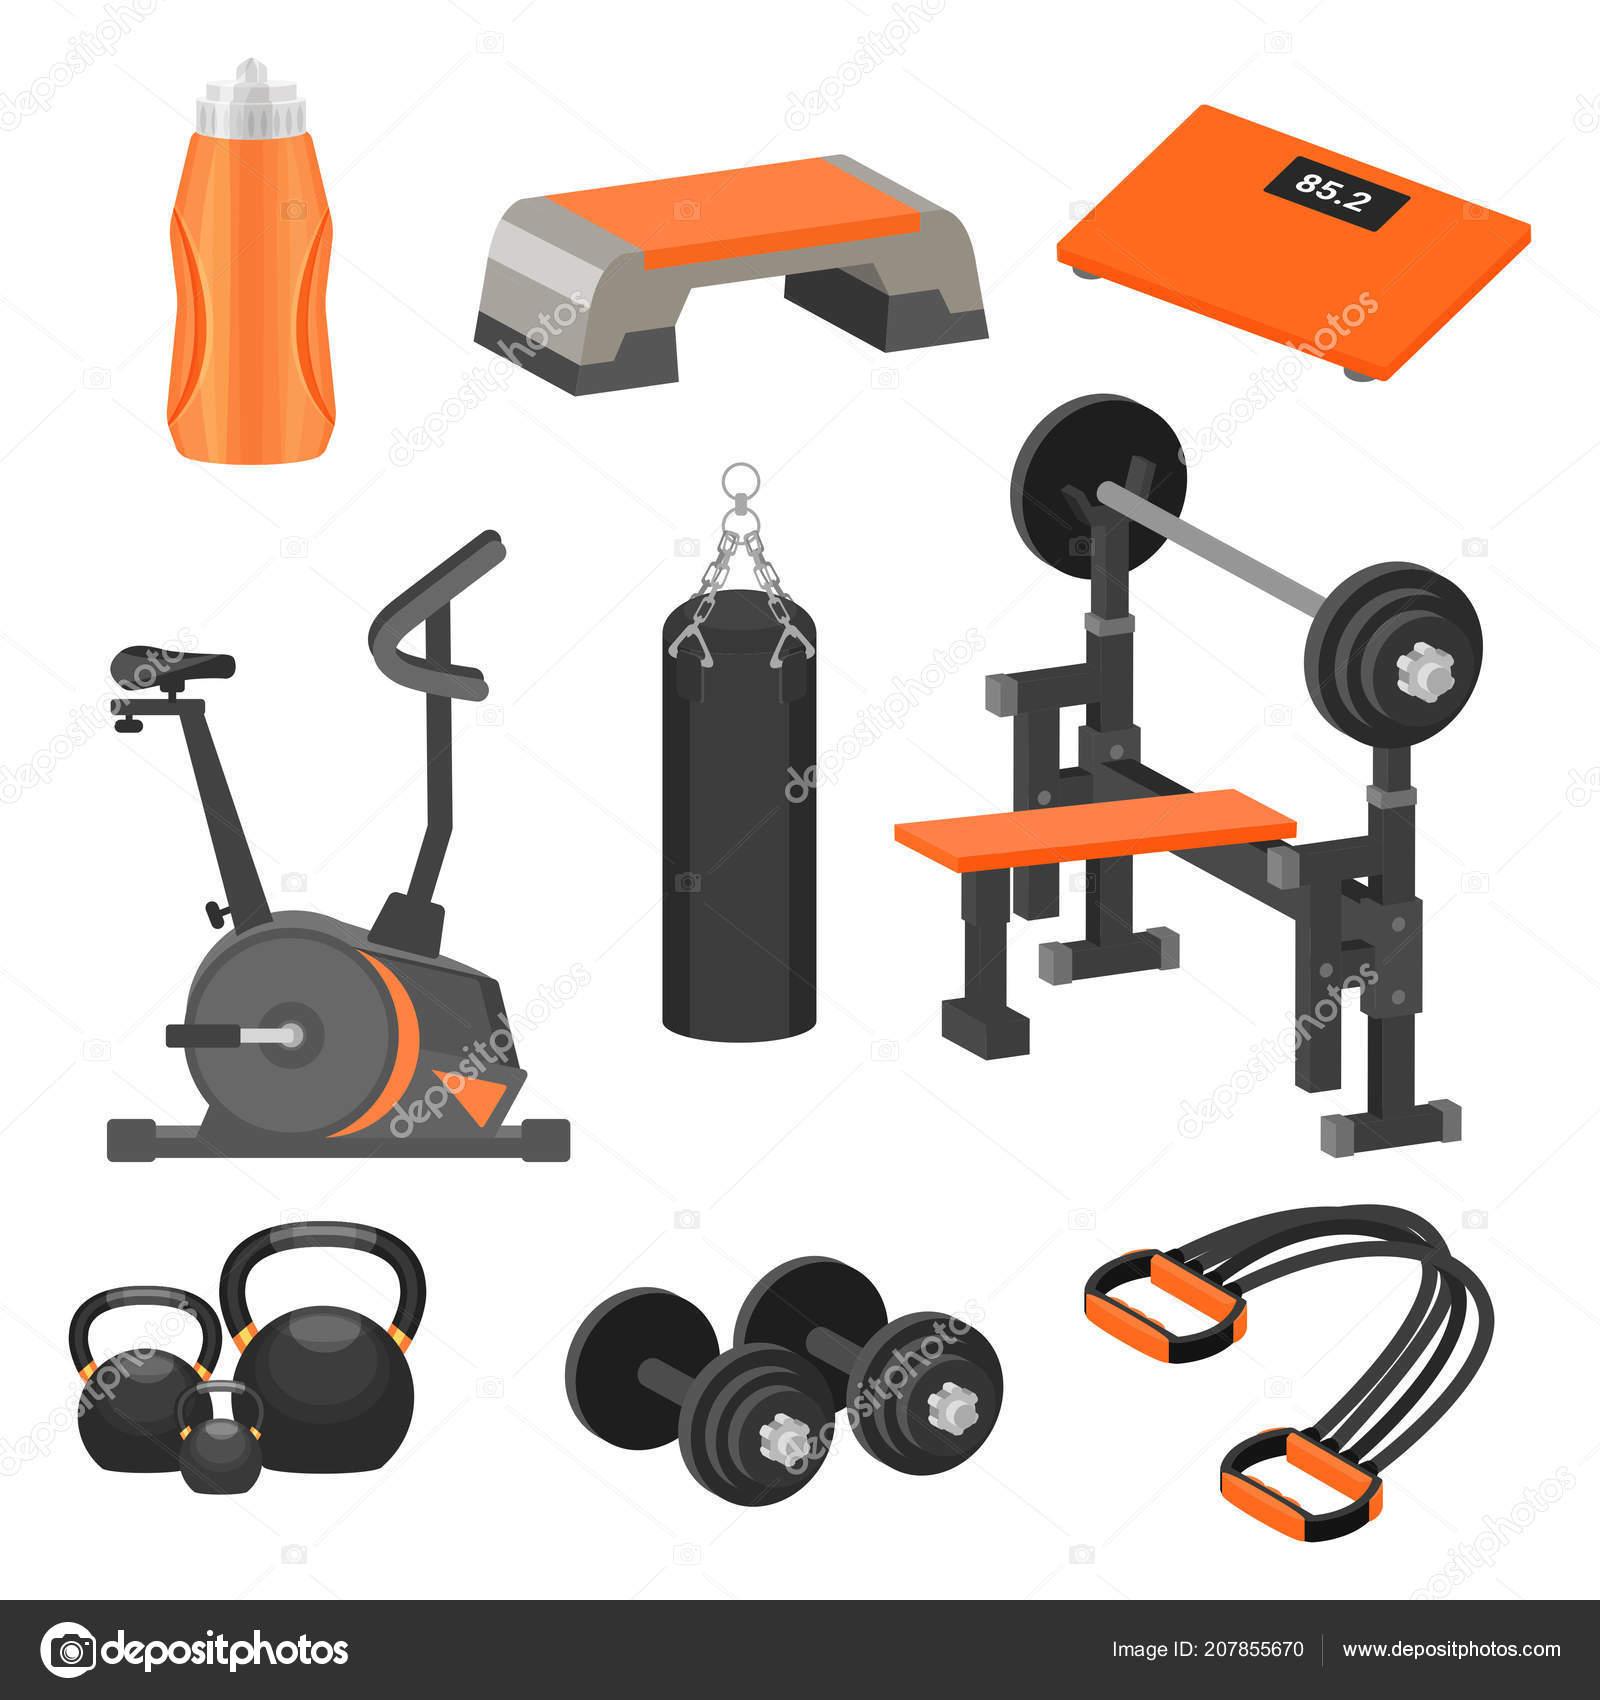 7b606d58e Conjunto de artigos de desporto diferente e equipamento de exercício. Tema  de estilo de vida saudável. Elementos gráficos coloridos para publicidade  cartaz ...